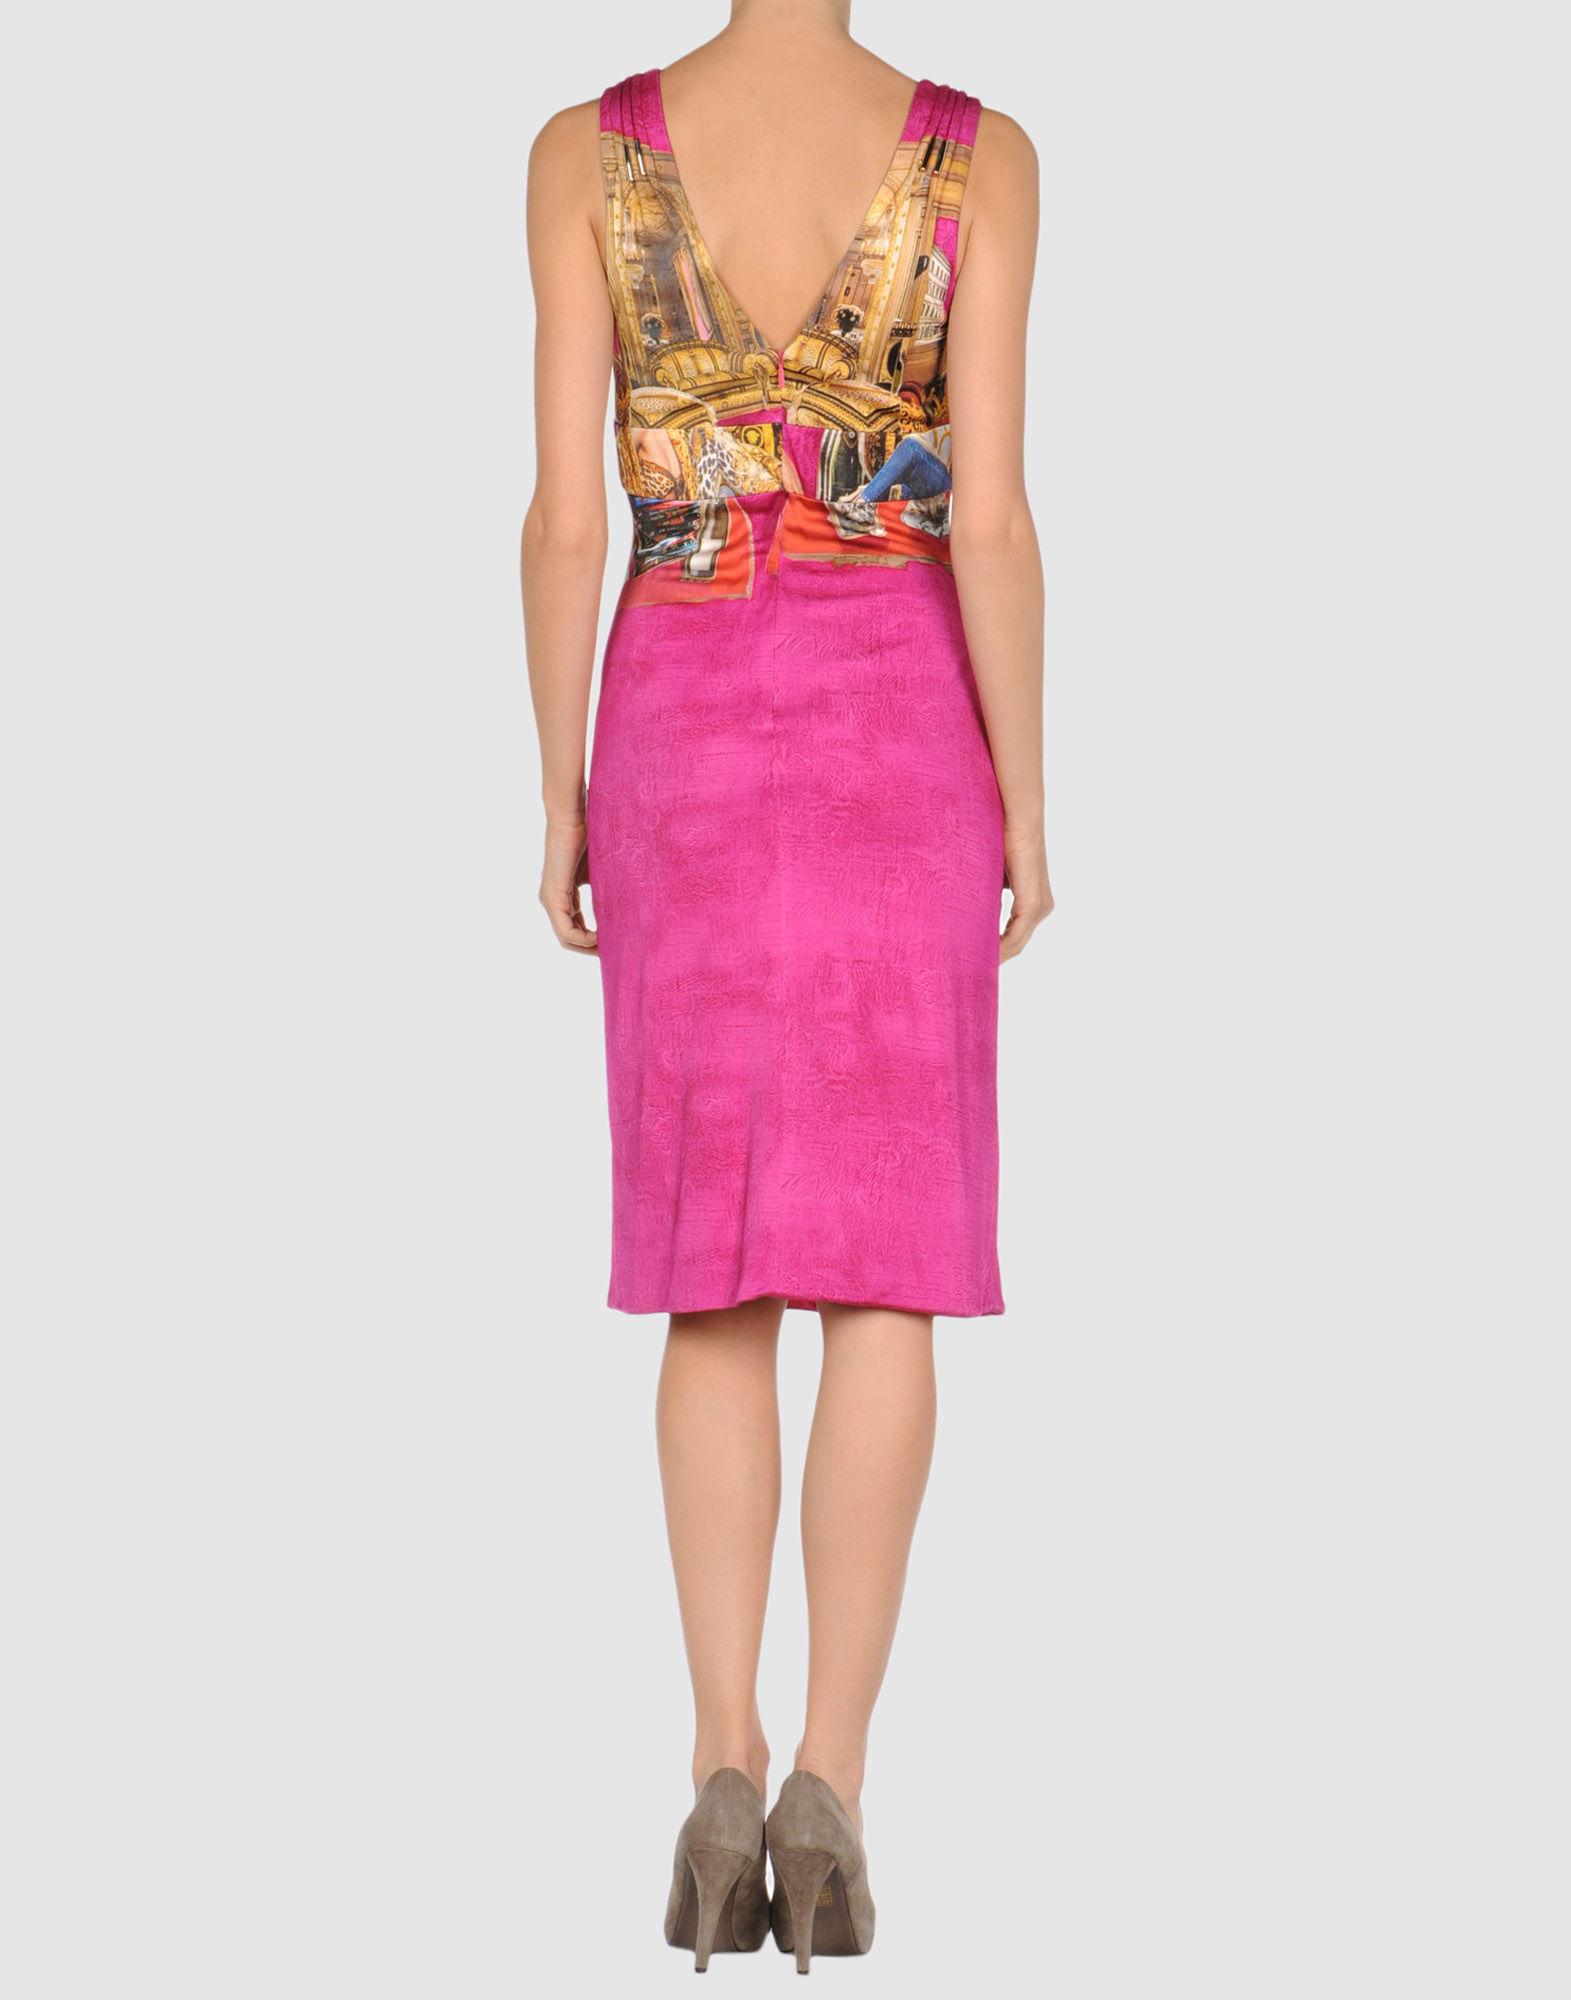 34224982NB 14 r - Evening Φορεματα Versace 2011 2012 Κωδ.13